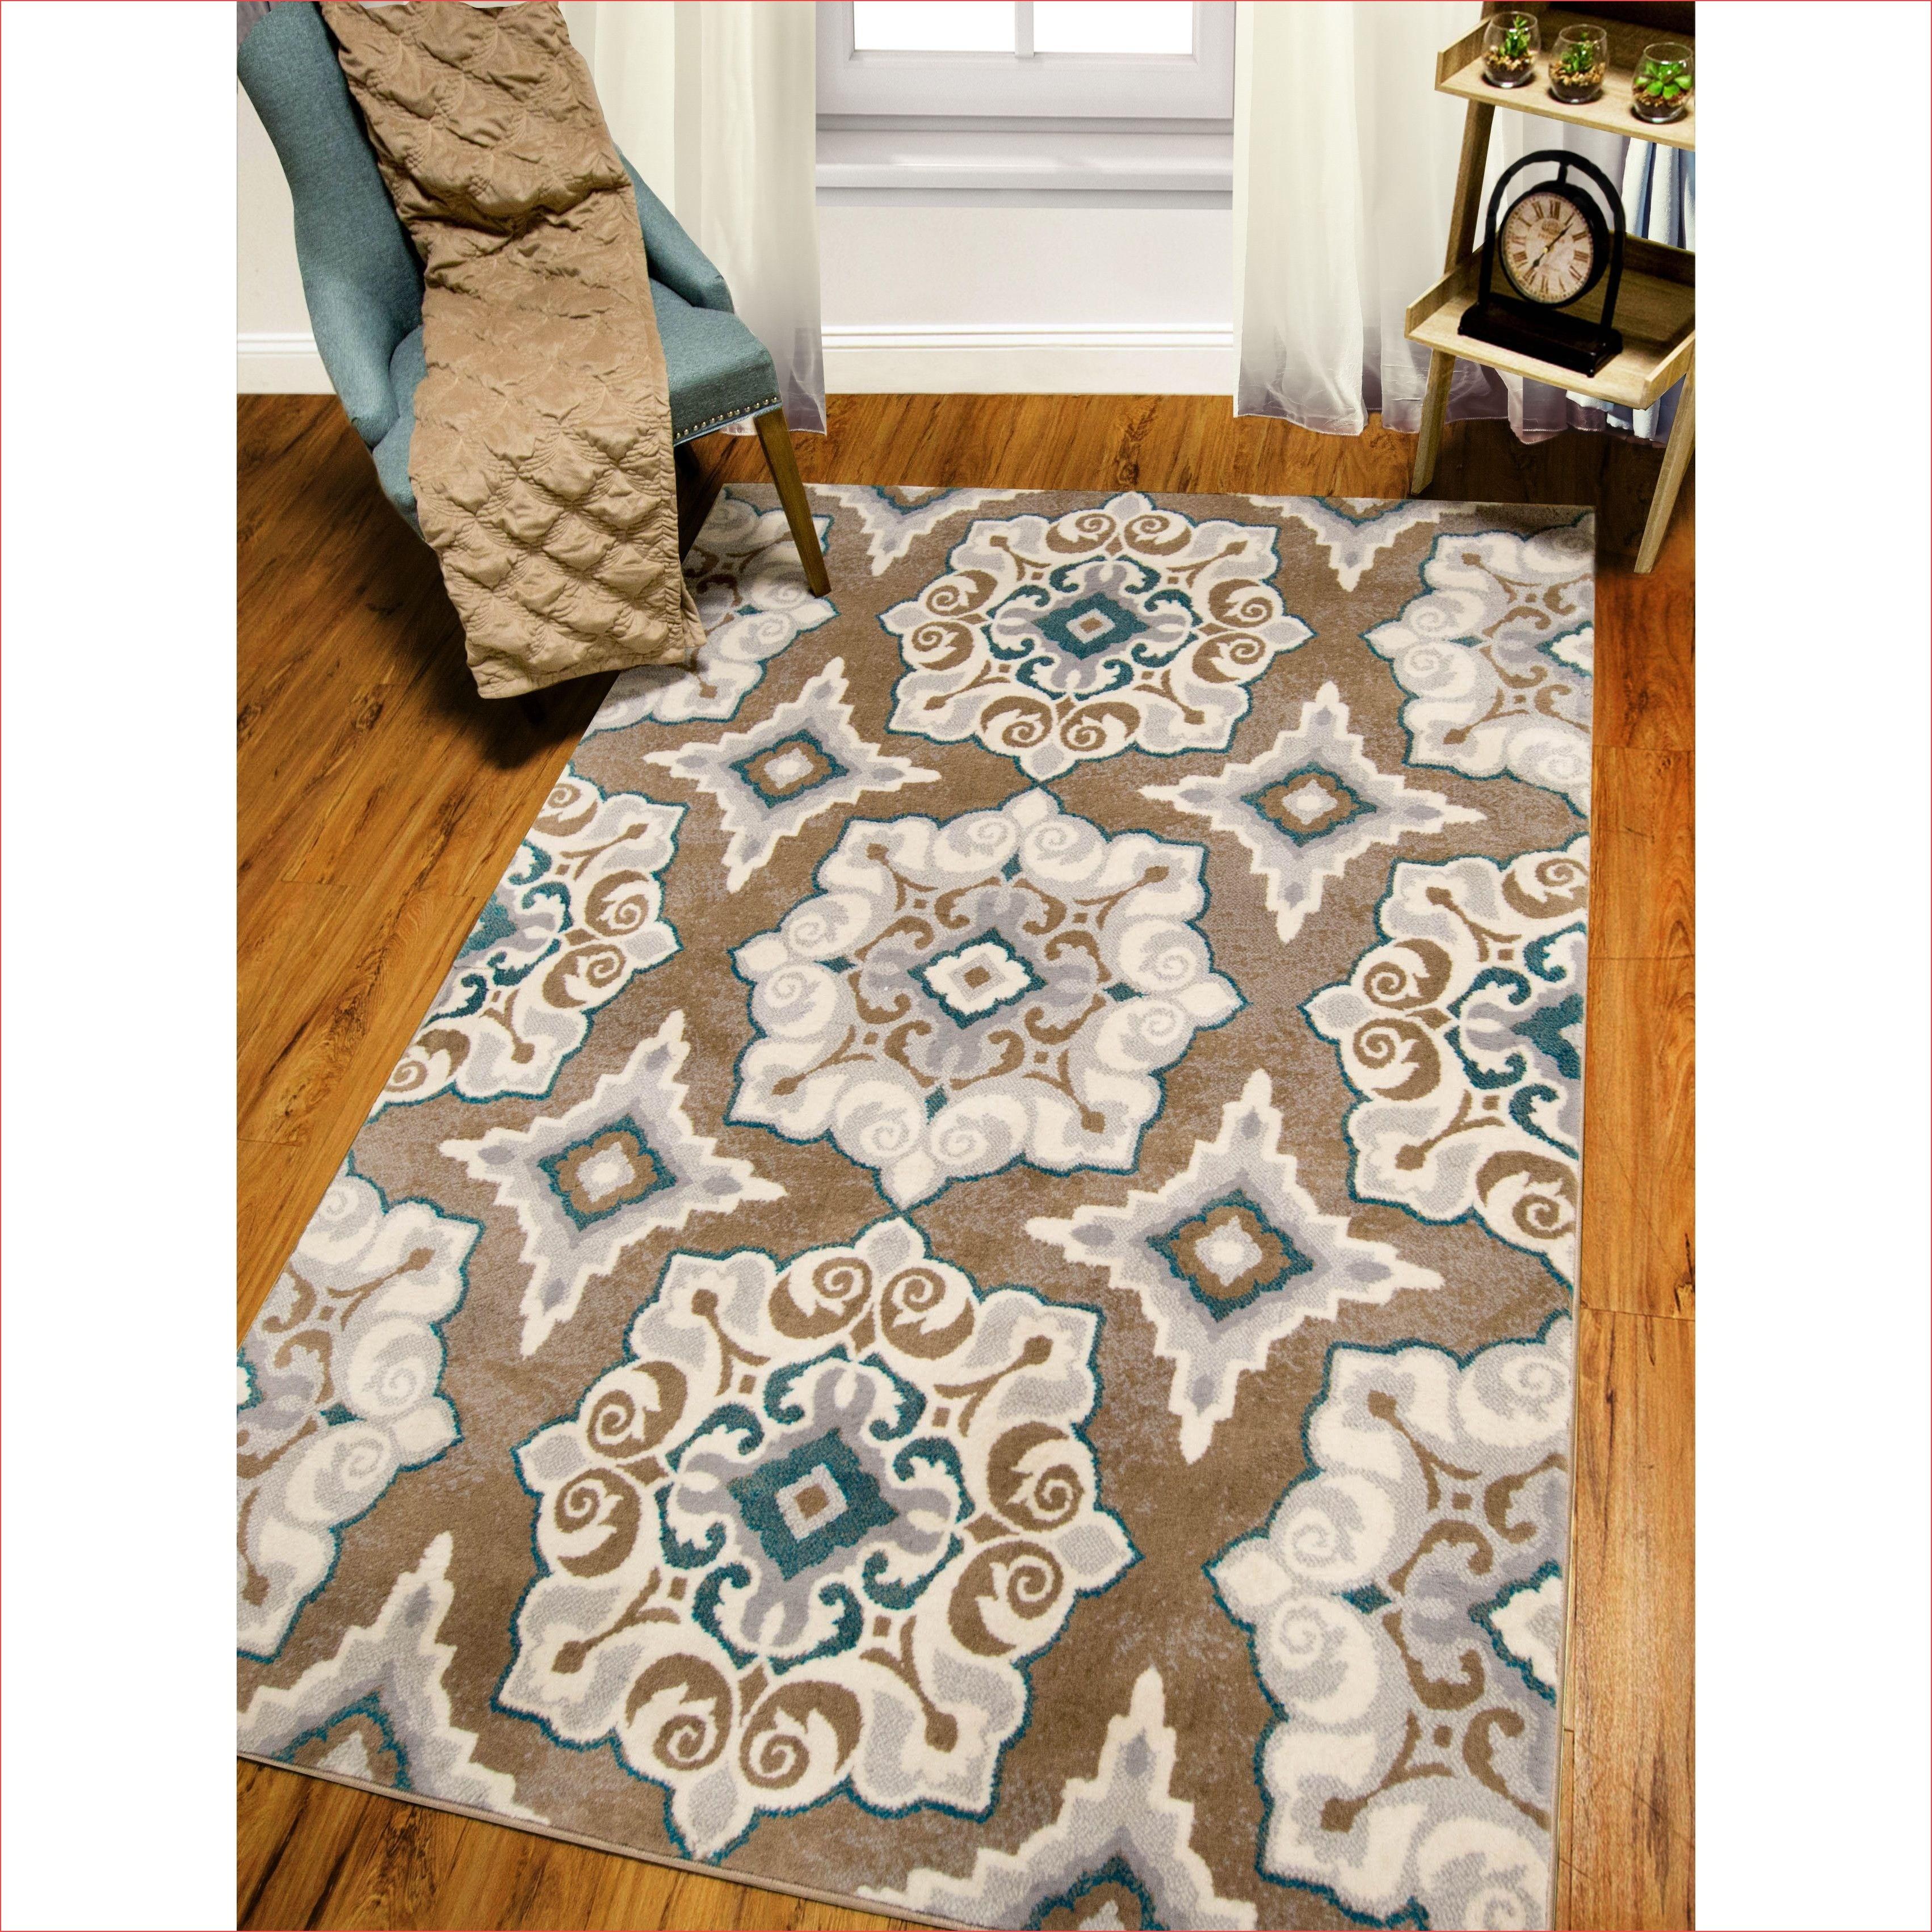 hardwood floors vs carpet of bedroom area rugs fresh area rugs for hardwood floors best jute rugs for bedroom area rugs luxury andover mills natural cerulean blue tan area rug of bedroom area rugs